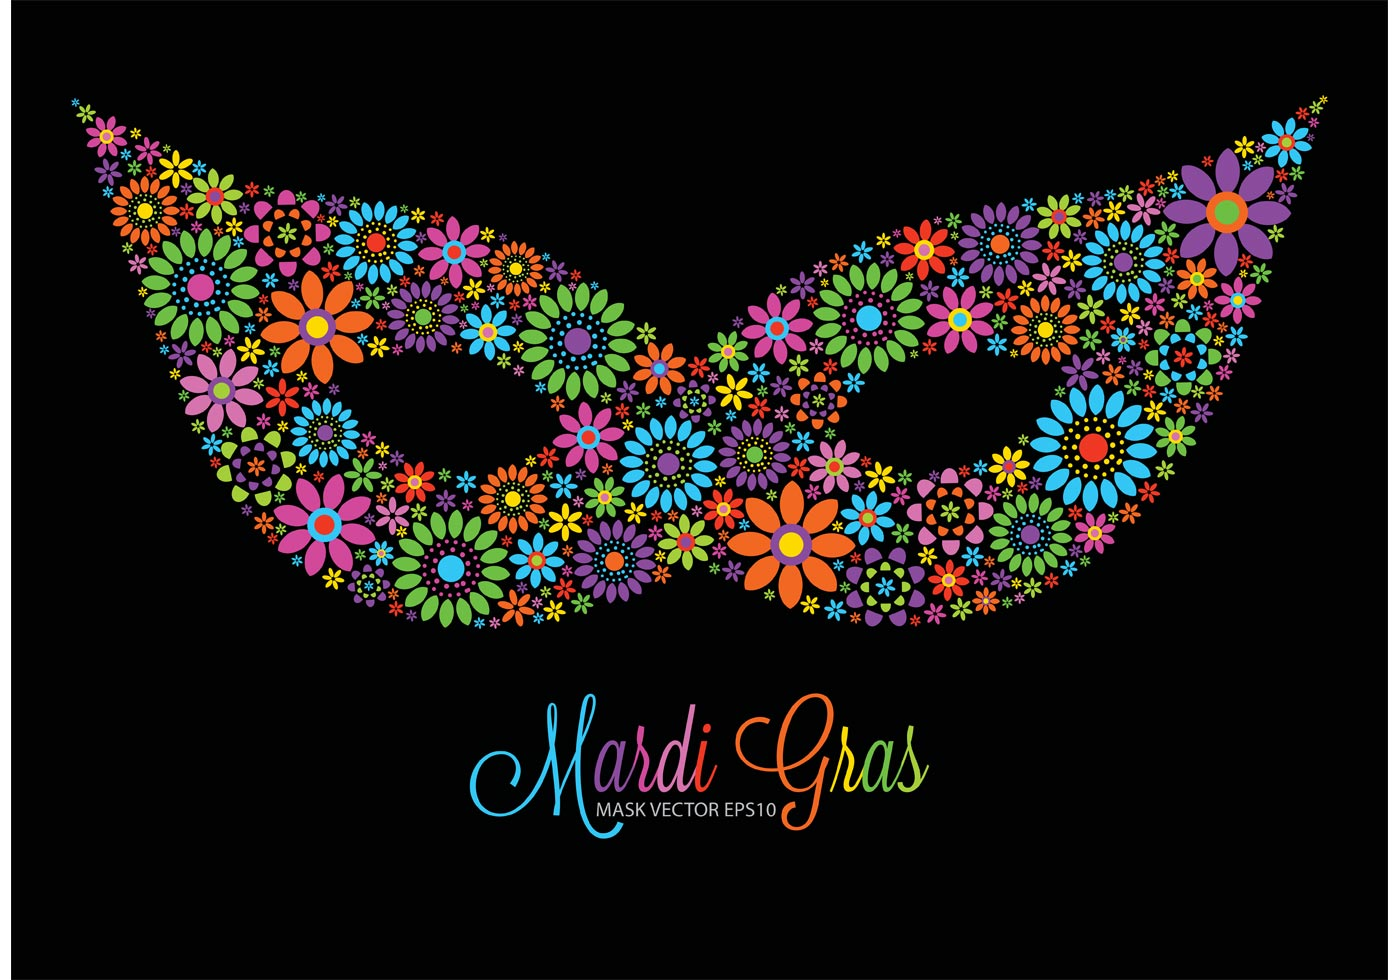 Free vector colorful flowers mardi gras mask download free vectors clipart graphics vector art - Free mardi gras pics ...